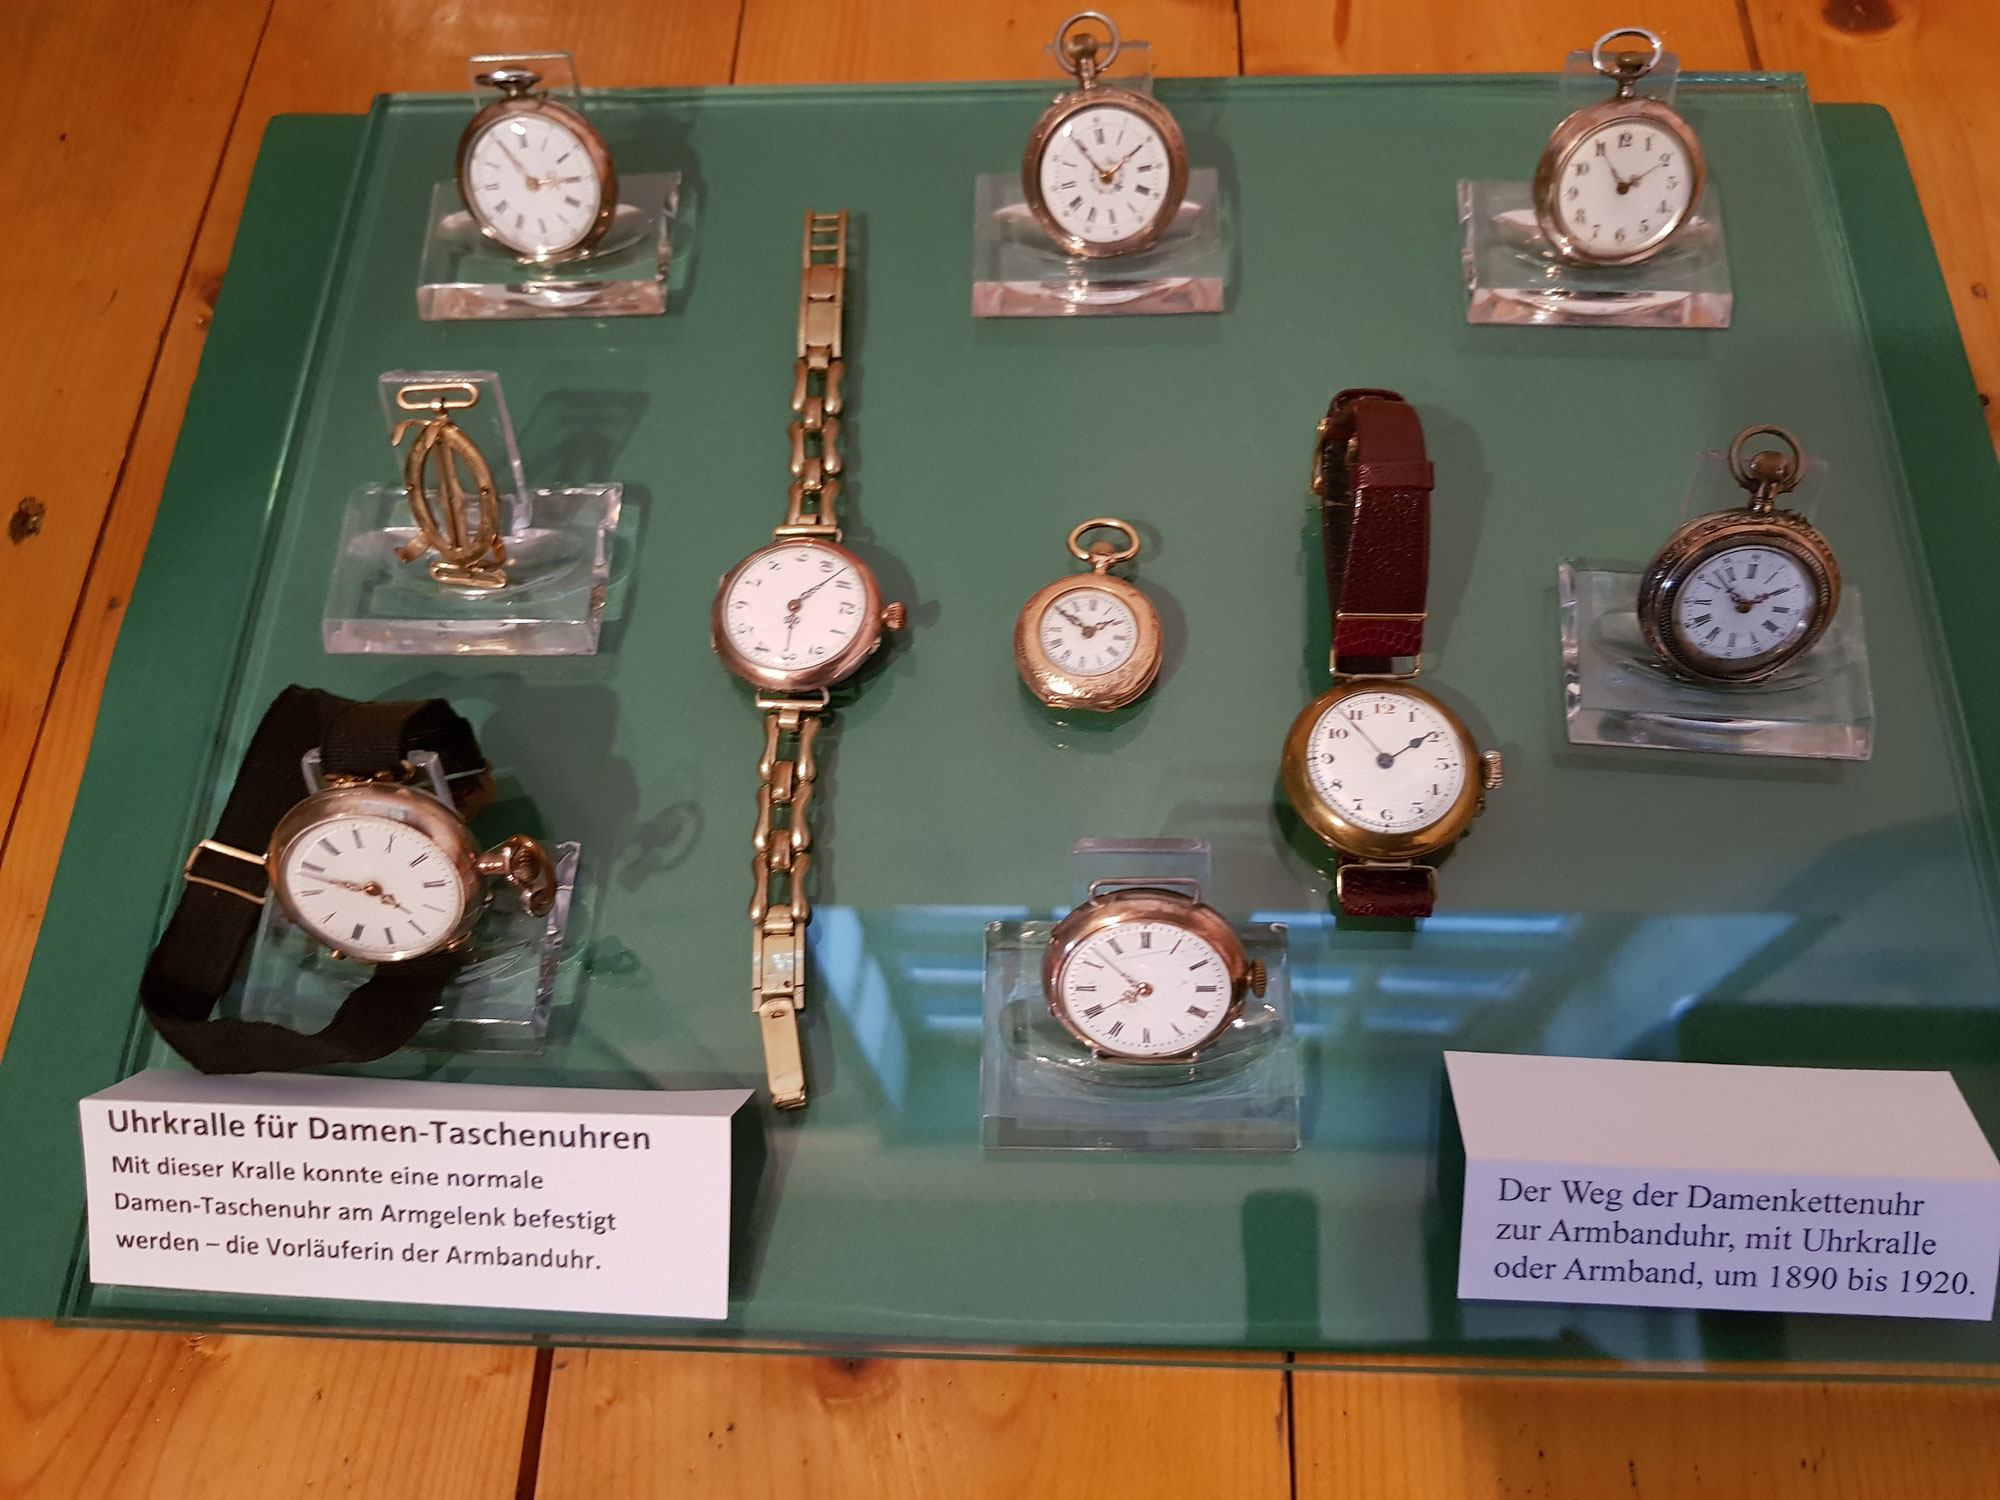 Faszination Uhrenwelt – im Kavalierhaus des Museums